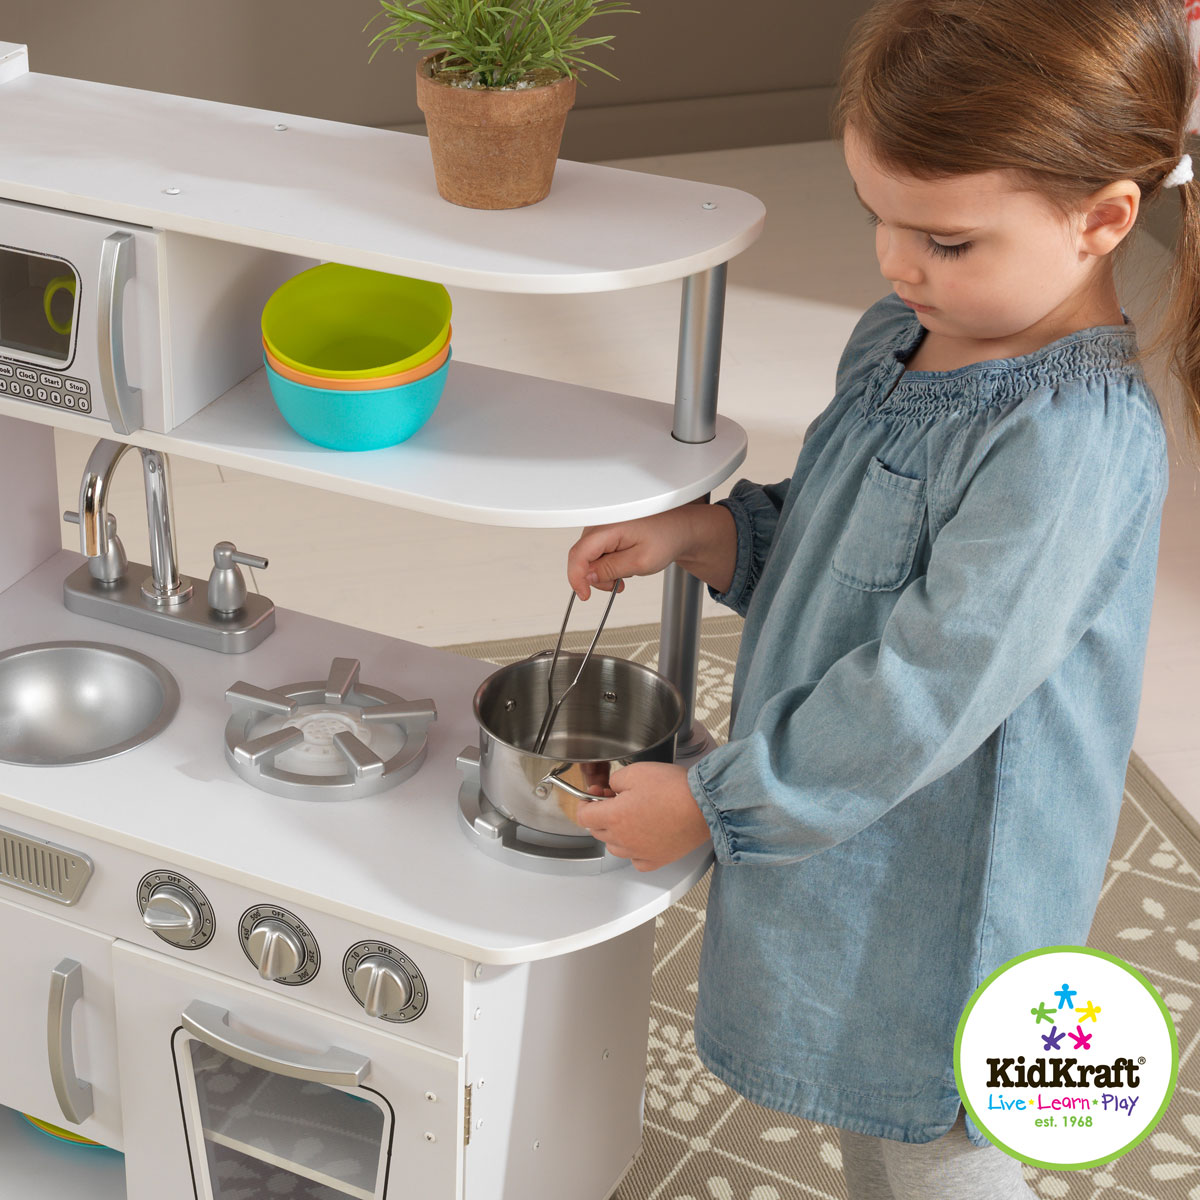 Cocina Retro 53208 Color Estilo Blanco Kidkraft WHI9ED2